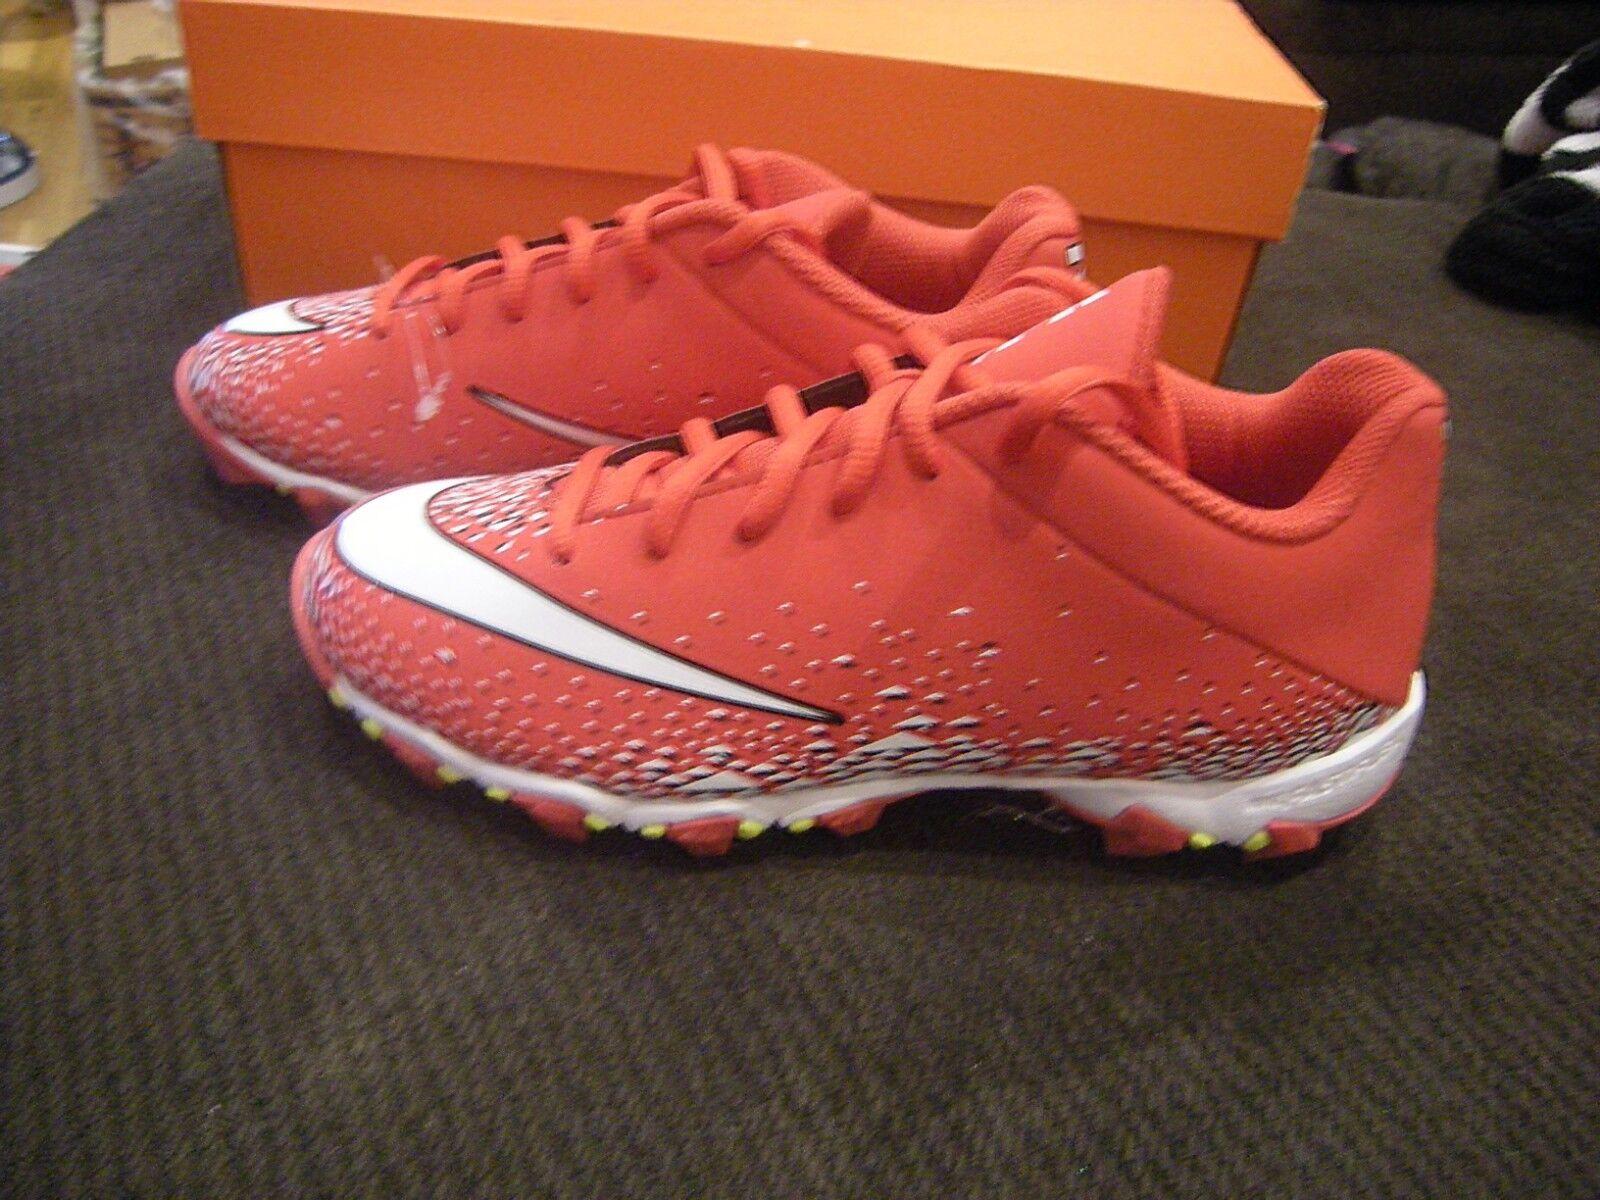 Boy's Nike 'Alpha Shark 2 3/4' Football Cleat, Size 2 M - Bl